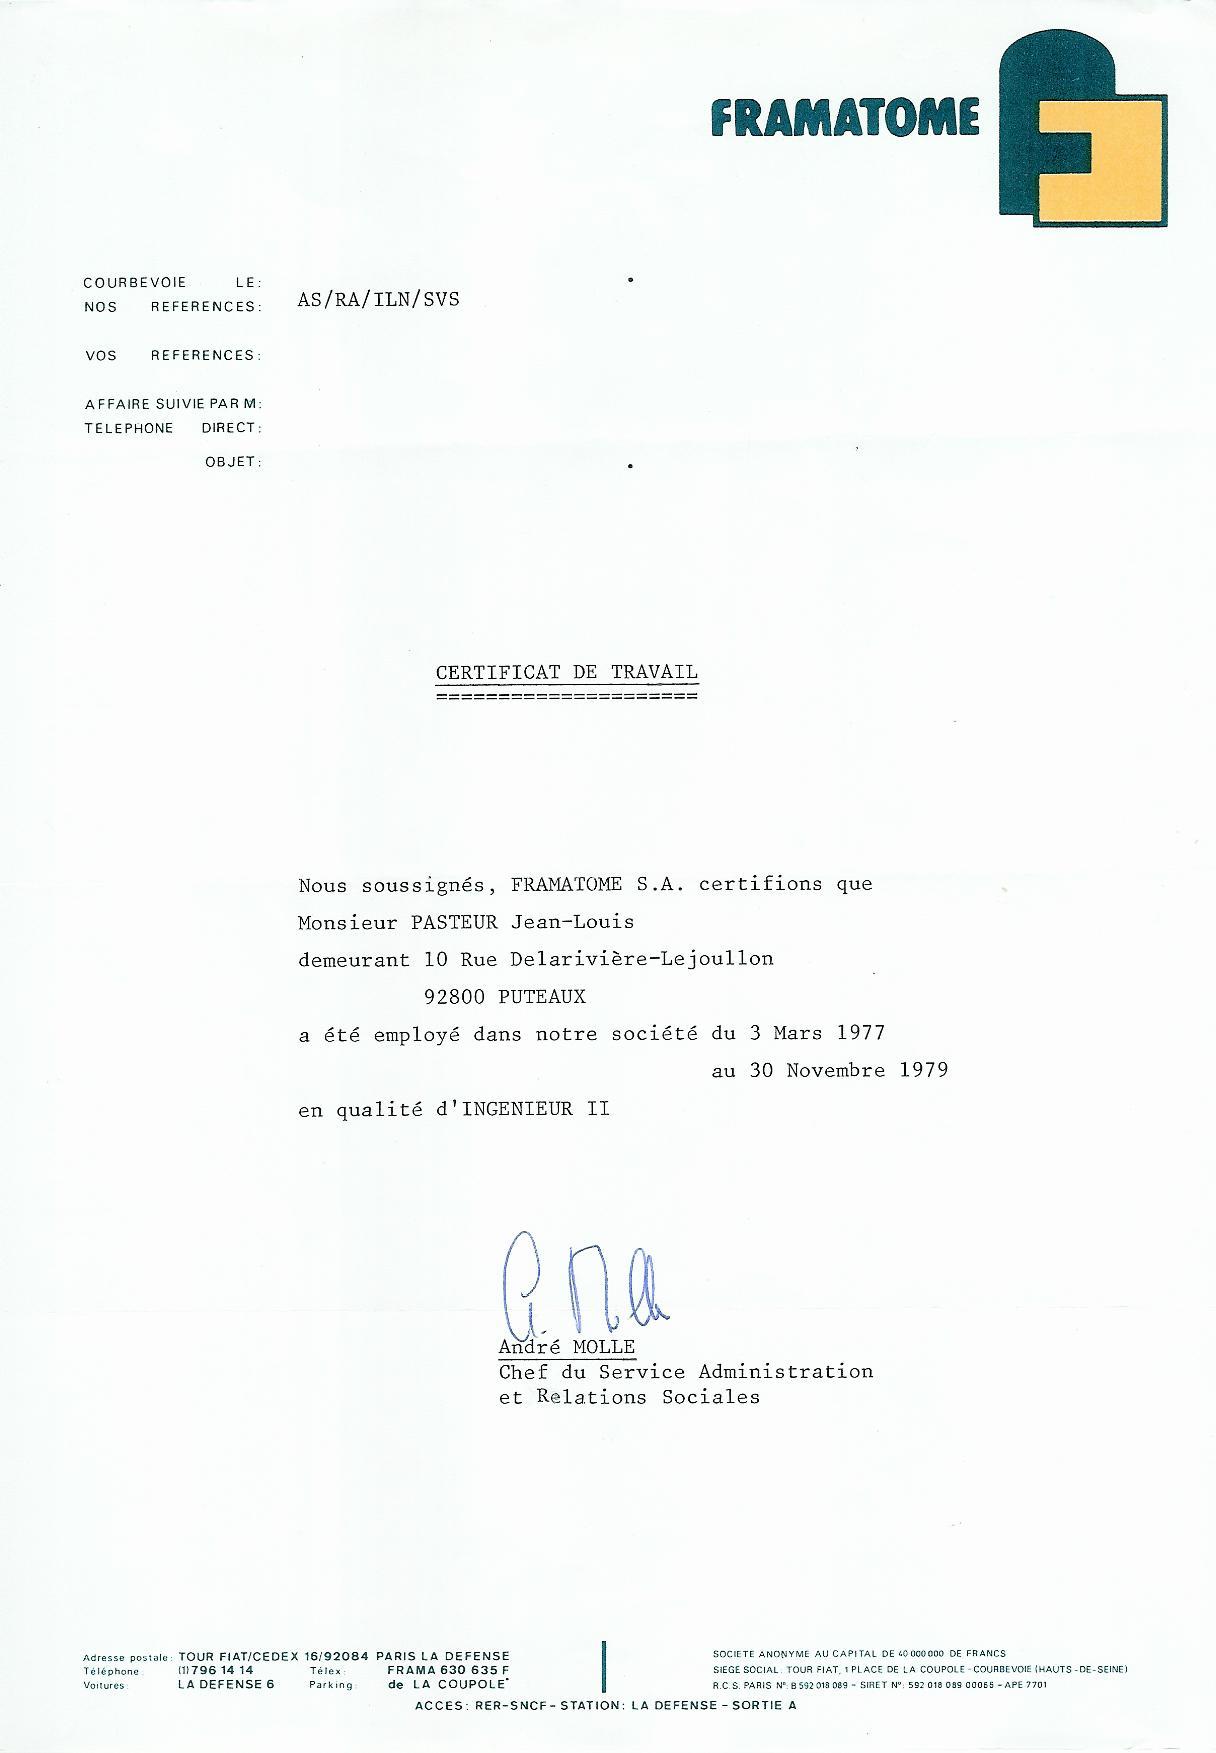 patrick ingenieur 1977